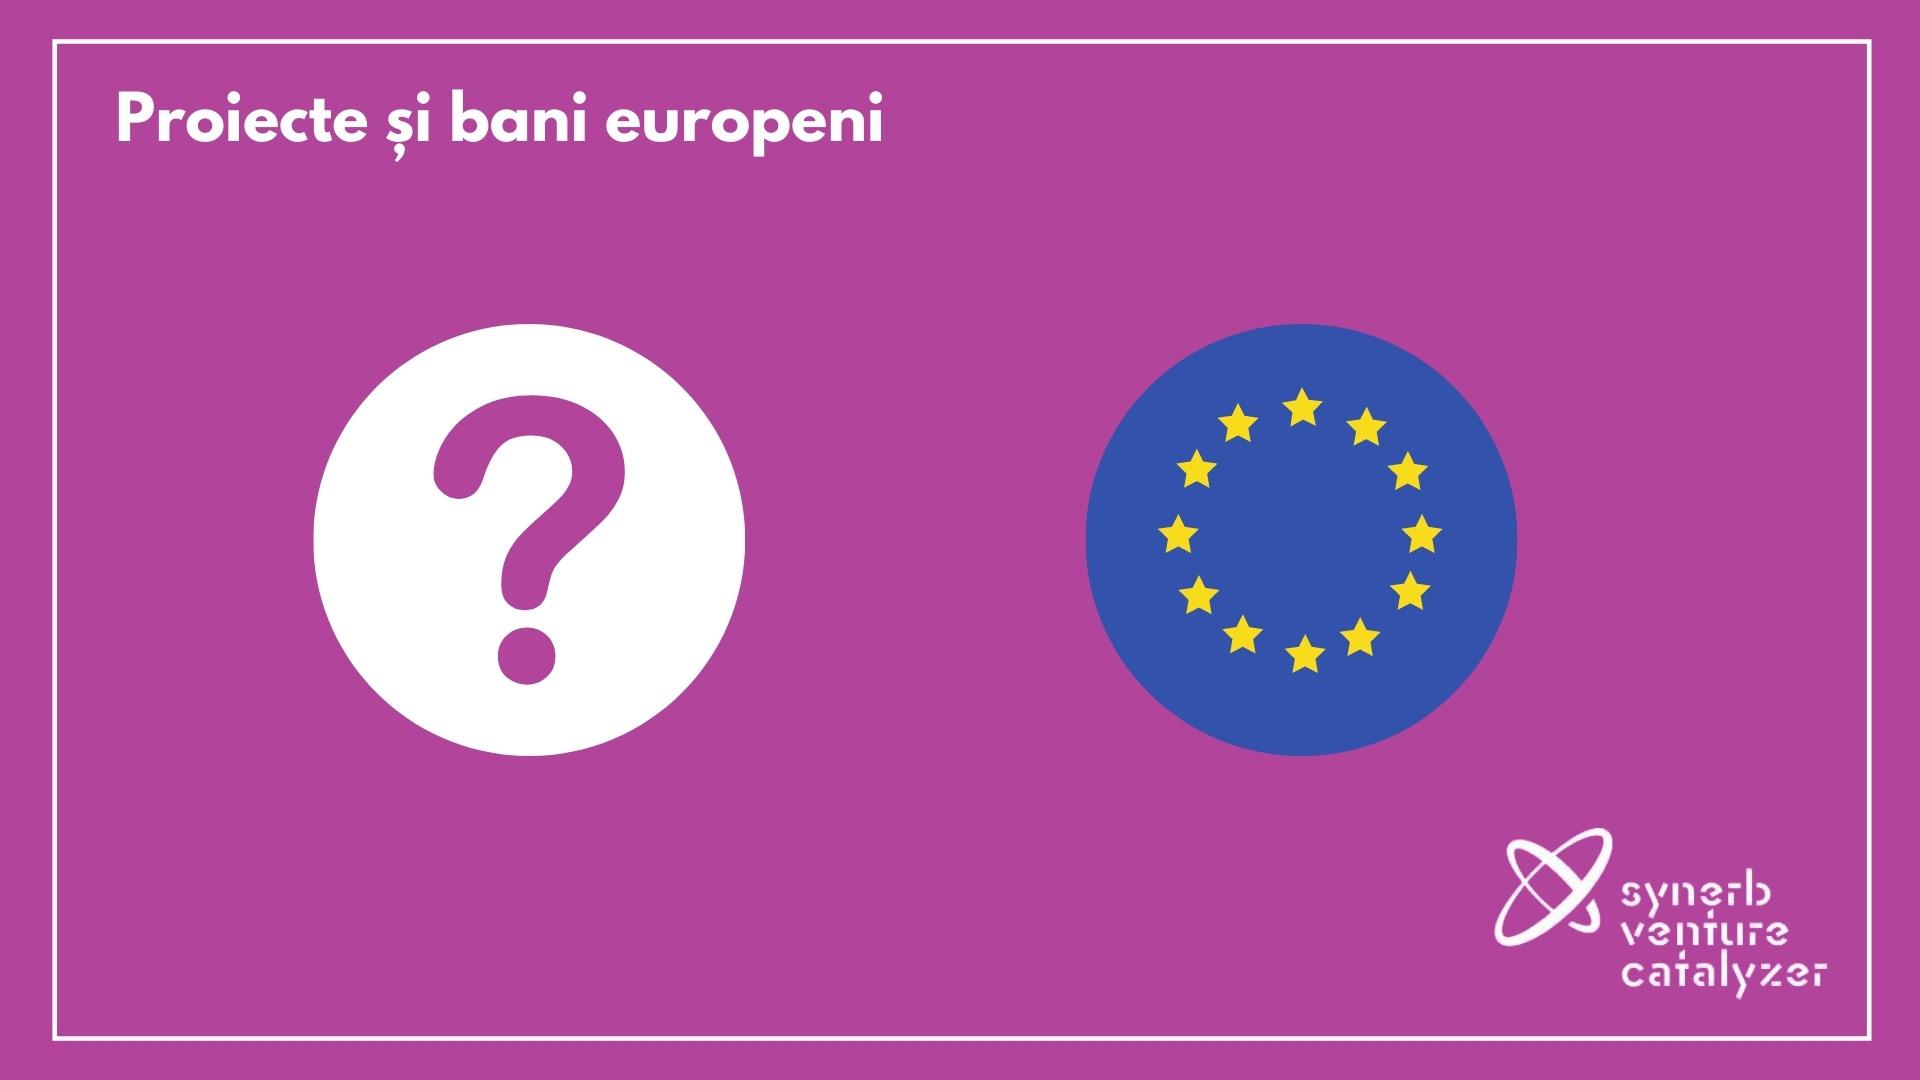 Synerb proiecte bani europeni